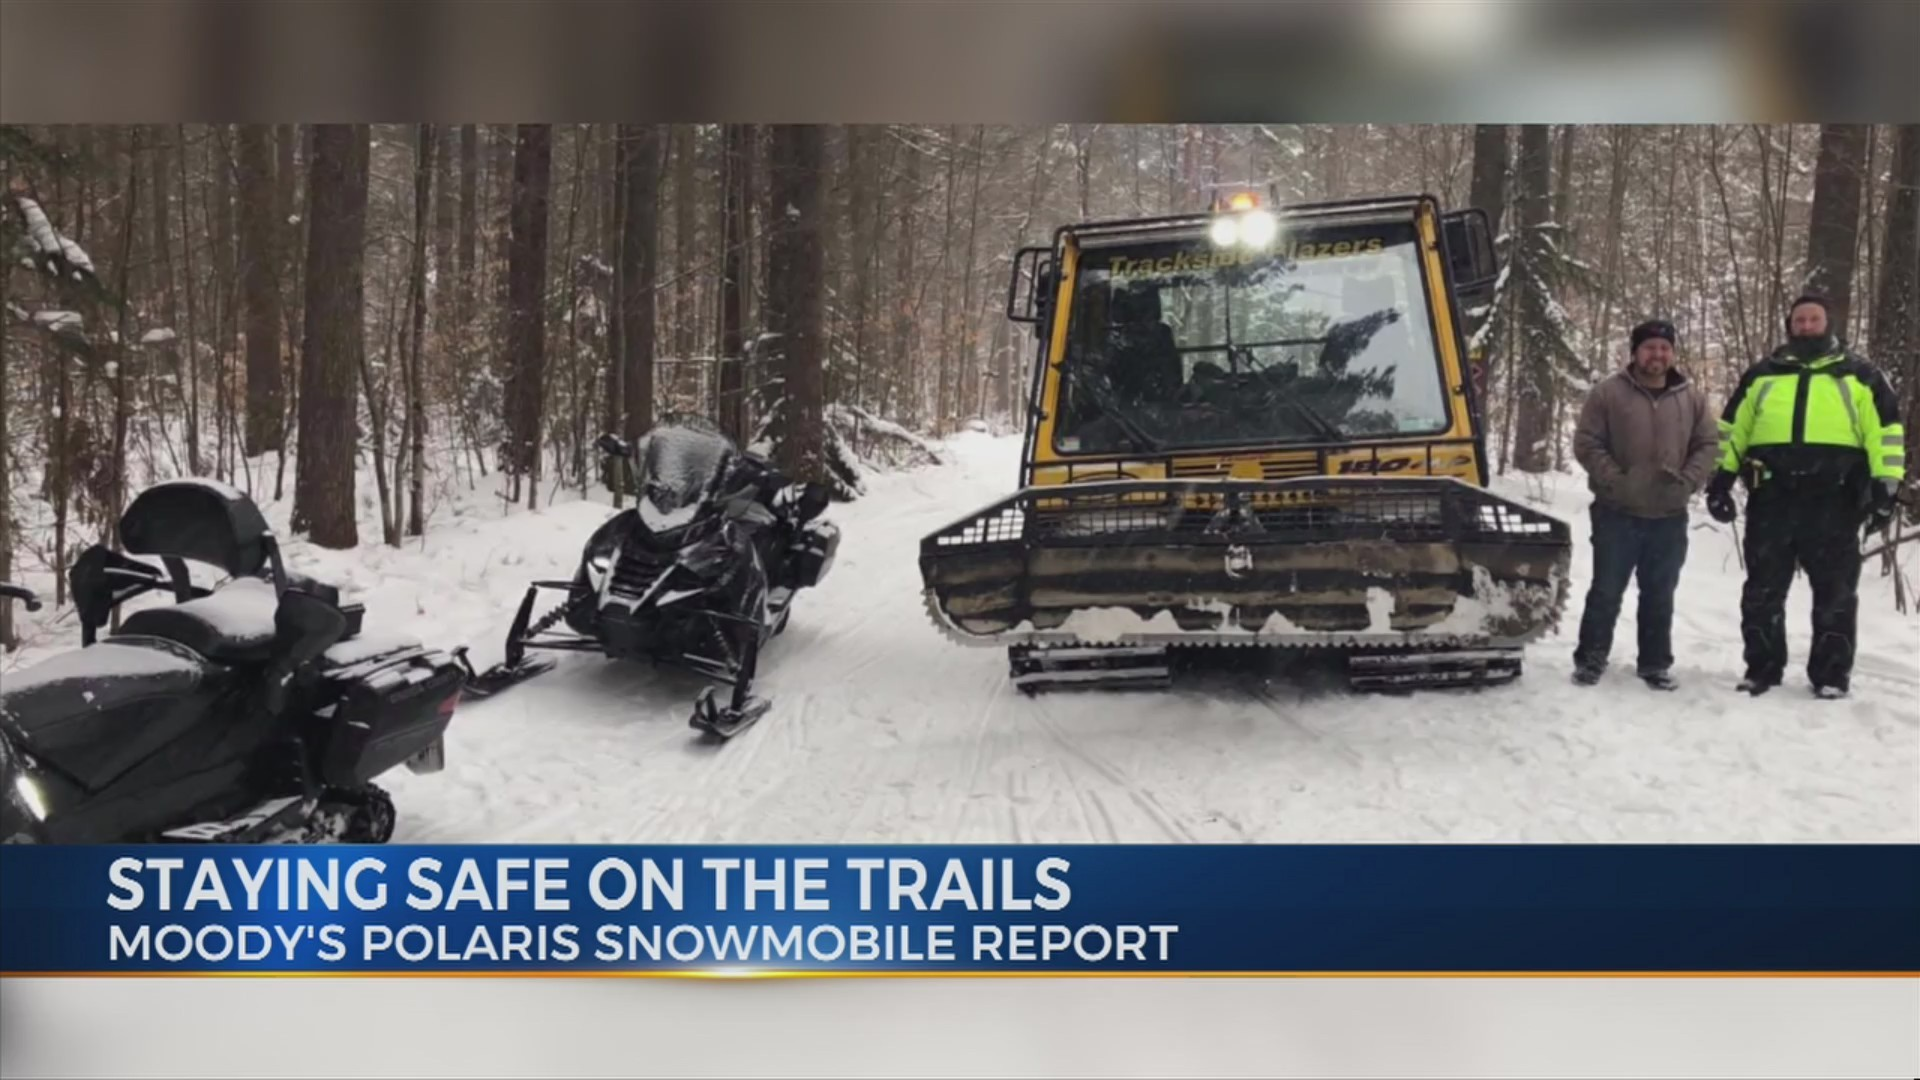 Moody's Polaris Snowmobile Report 1-24